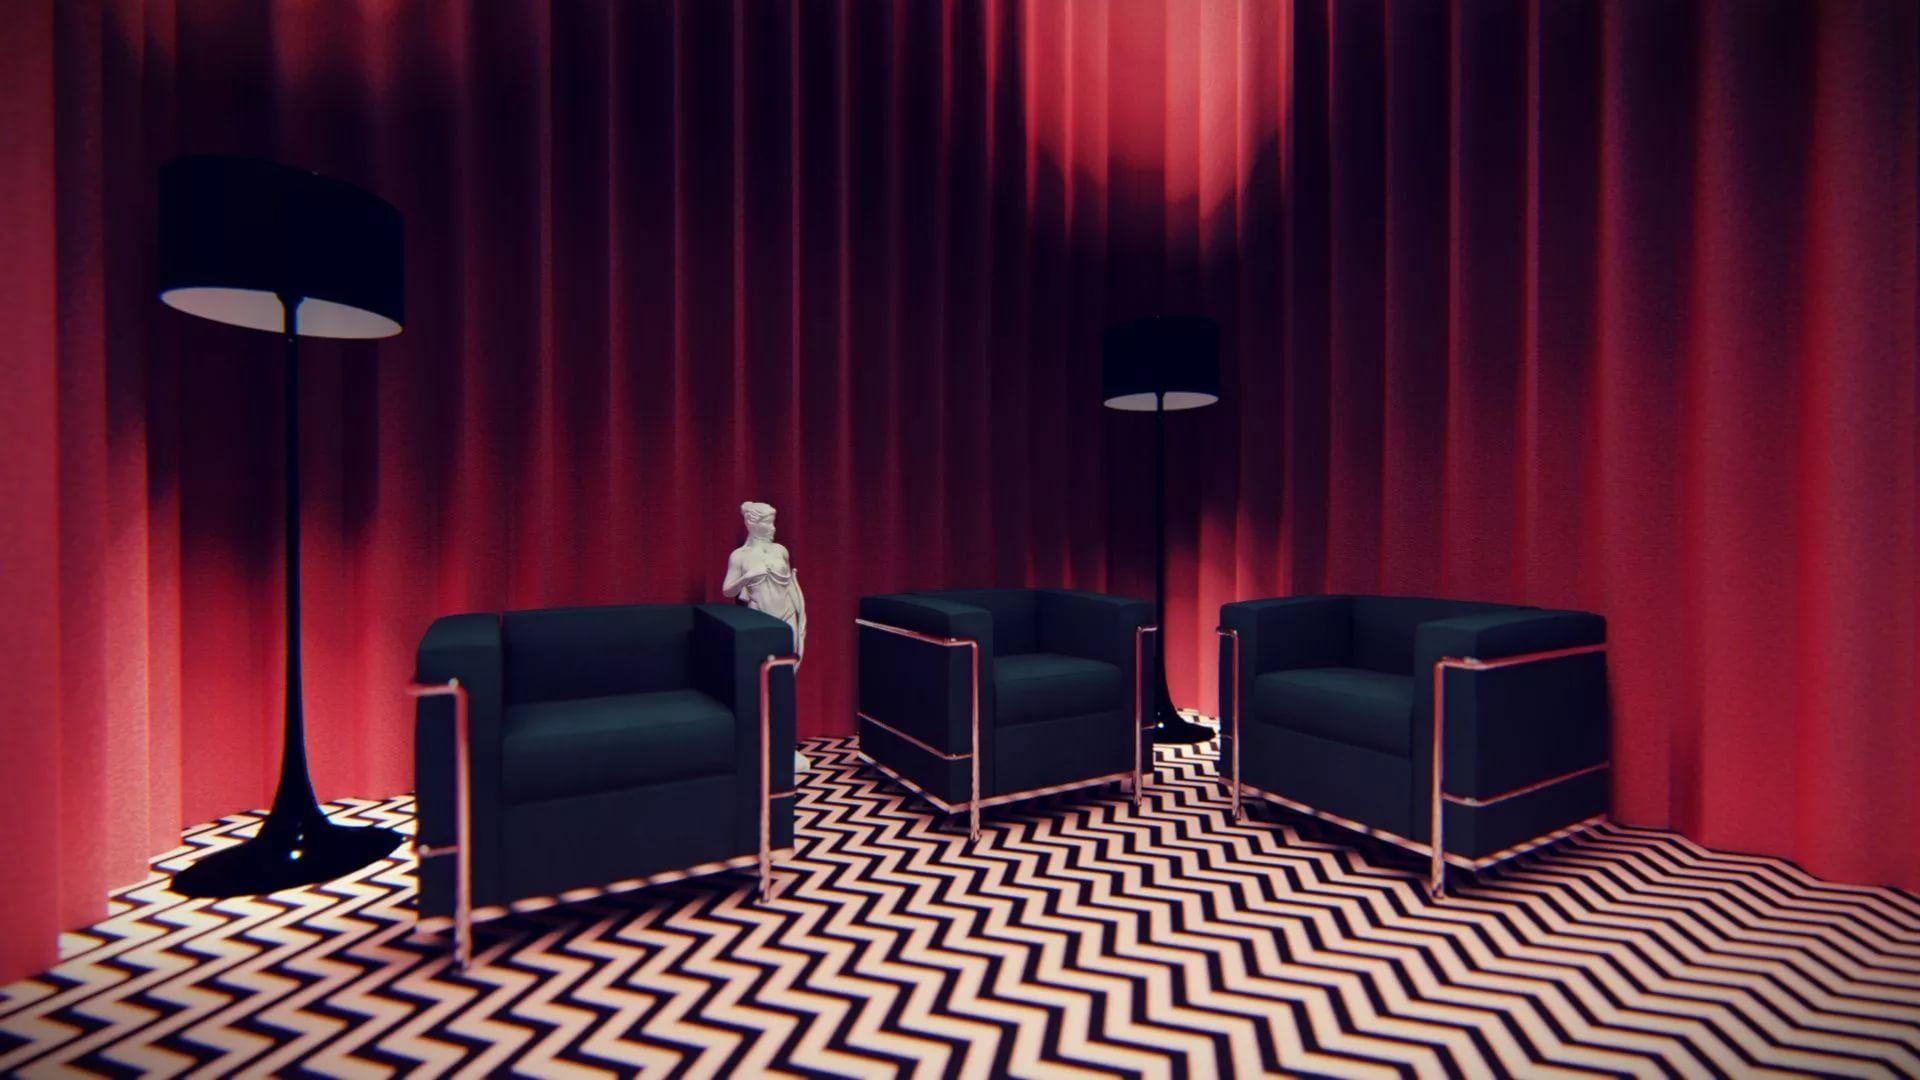 Twin Peaks download free wallpaper image search